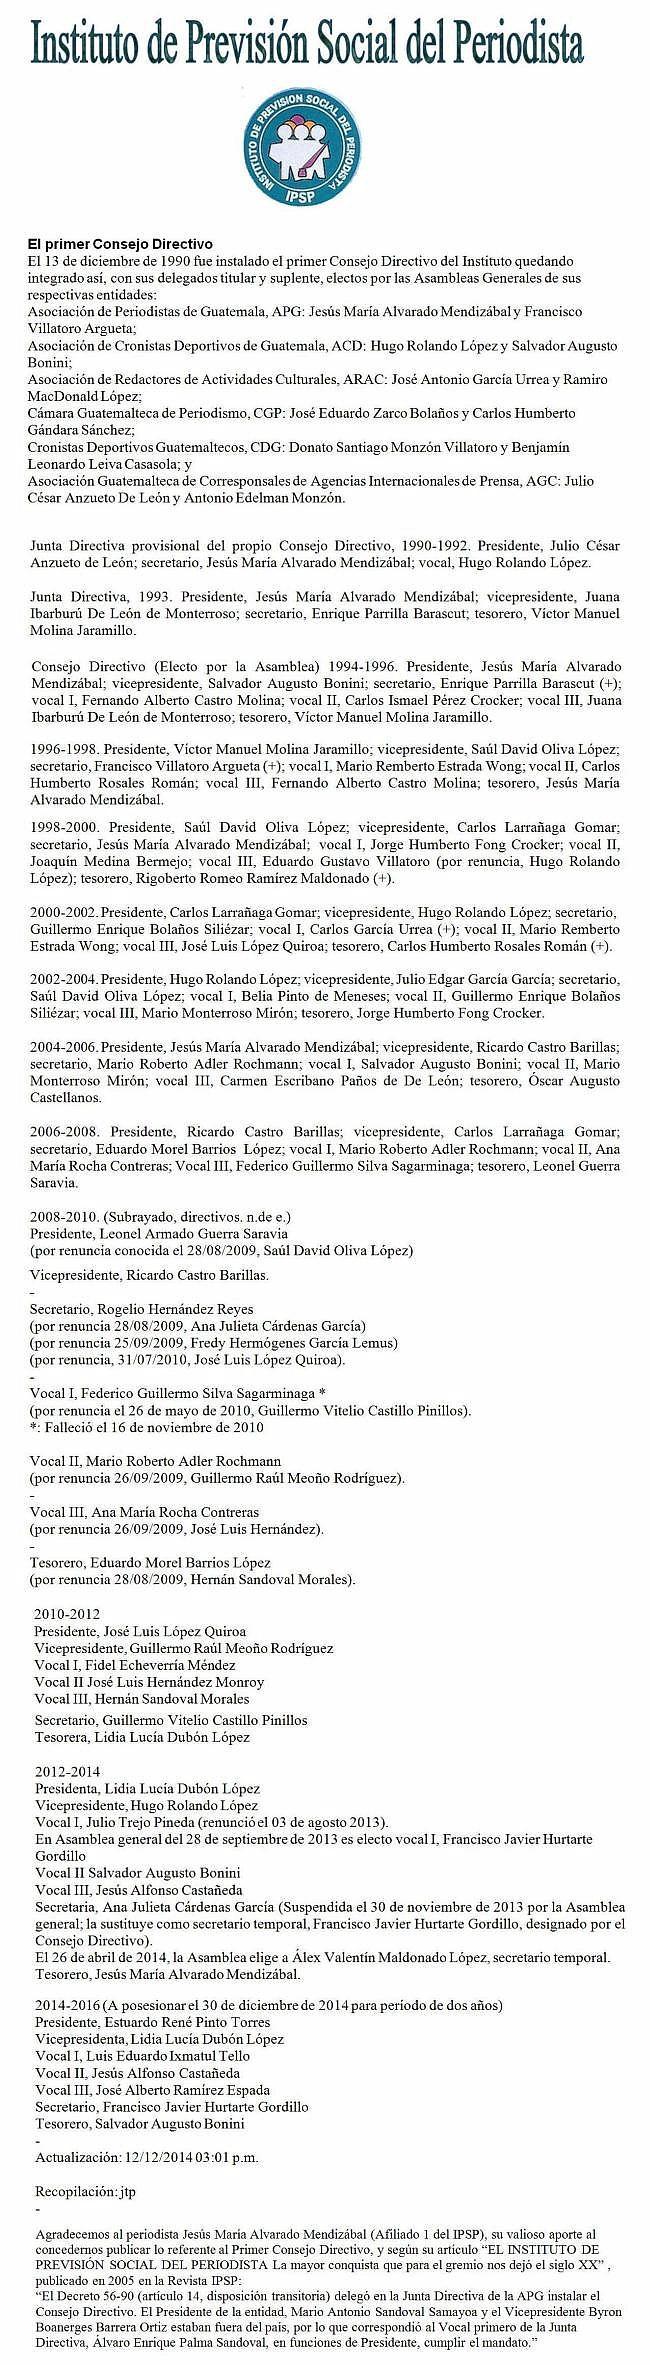 Consejo Directivo 1990 a 2016 - - -